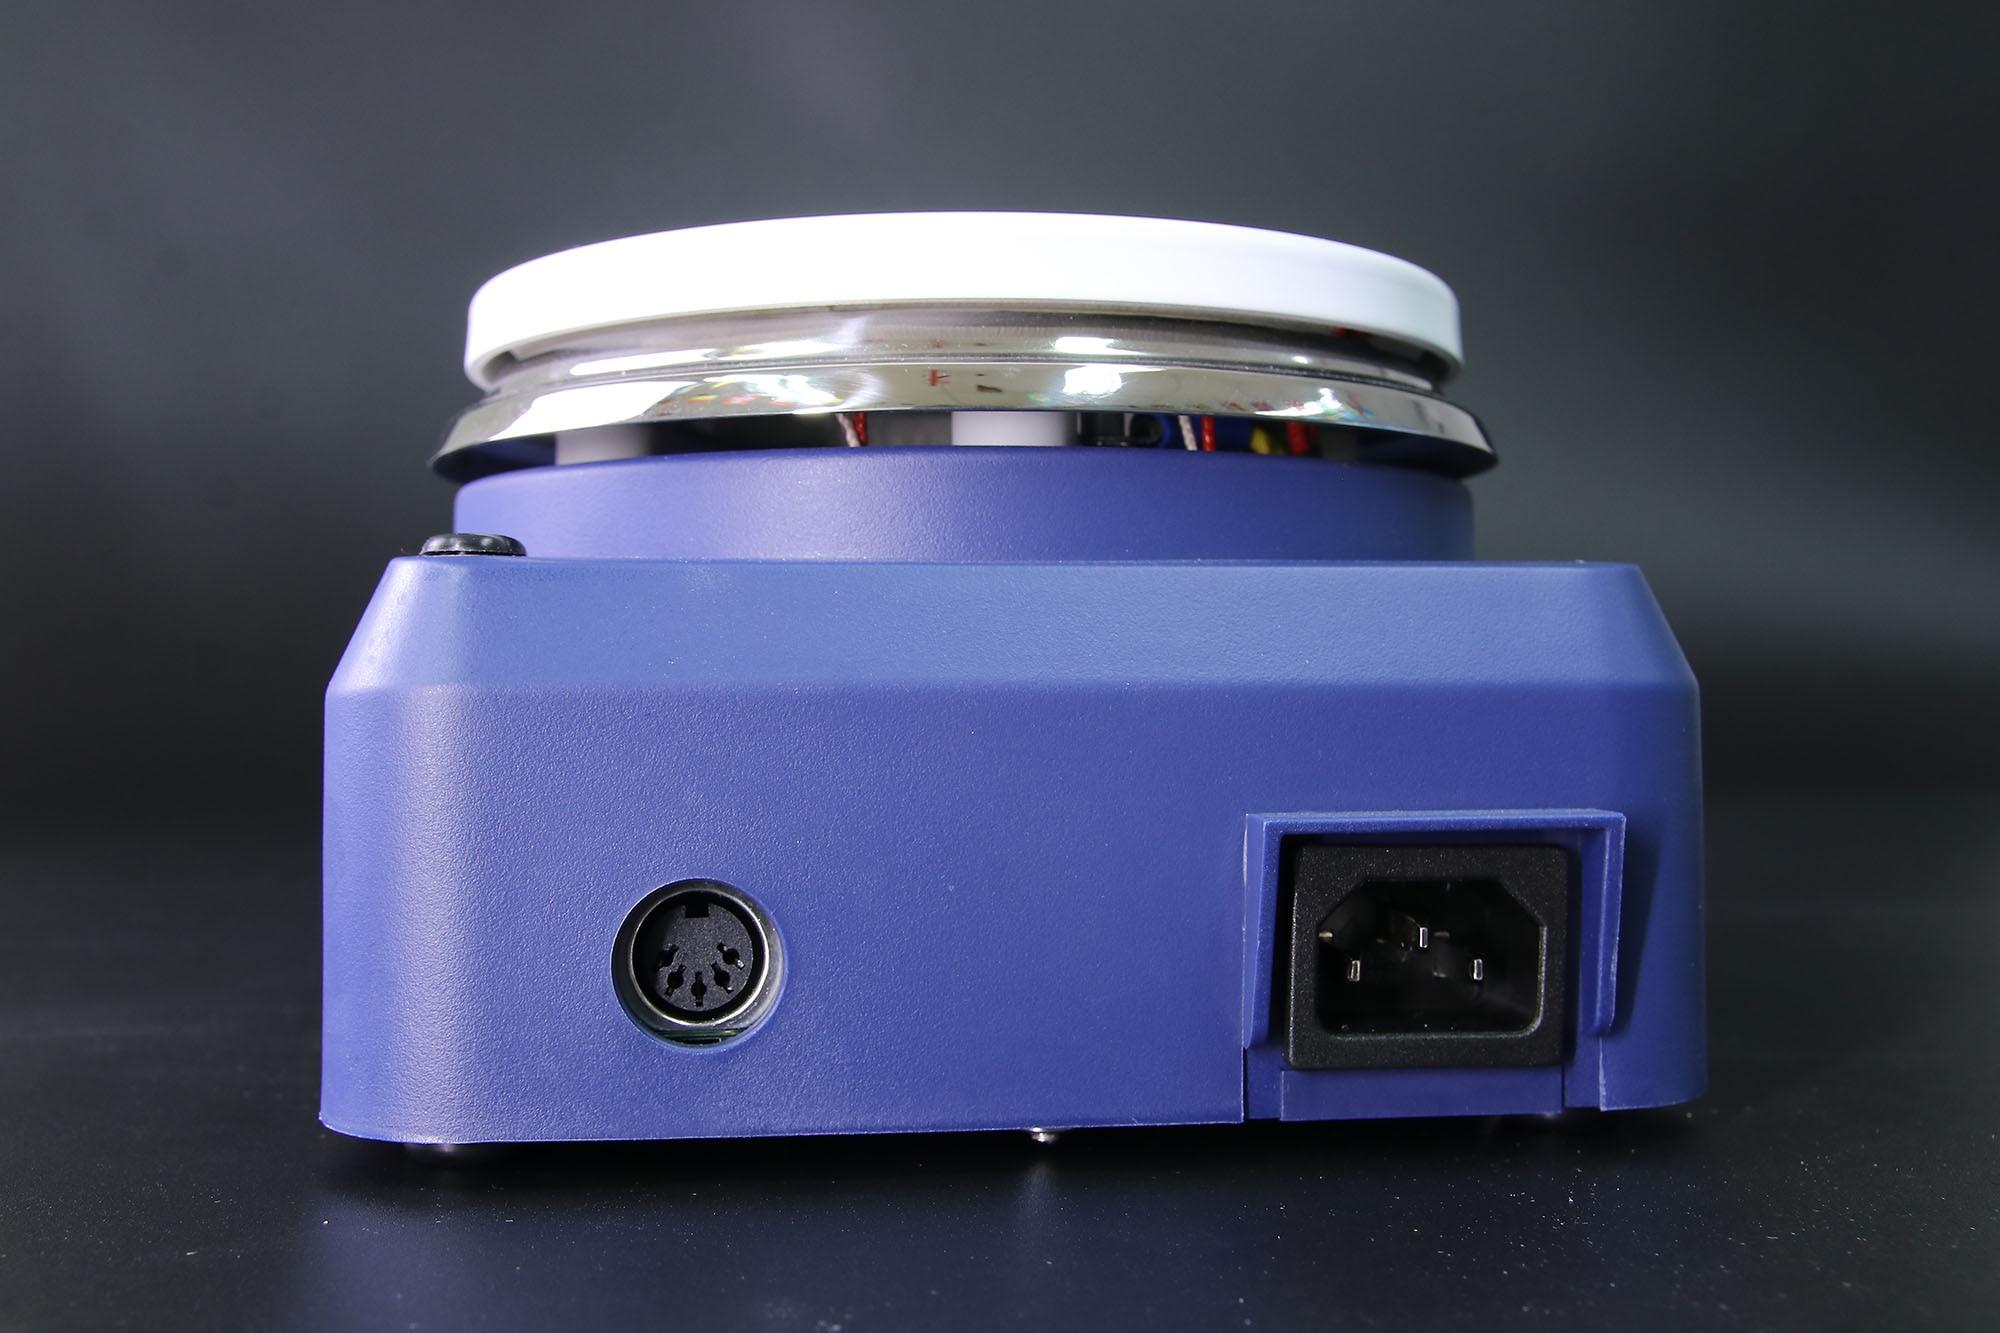 Laboratory Digital Hot Plate Magnetic Stirrer With Hotplate MS-H280-Pro Dlab 3